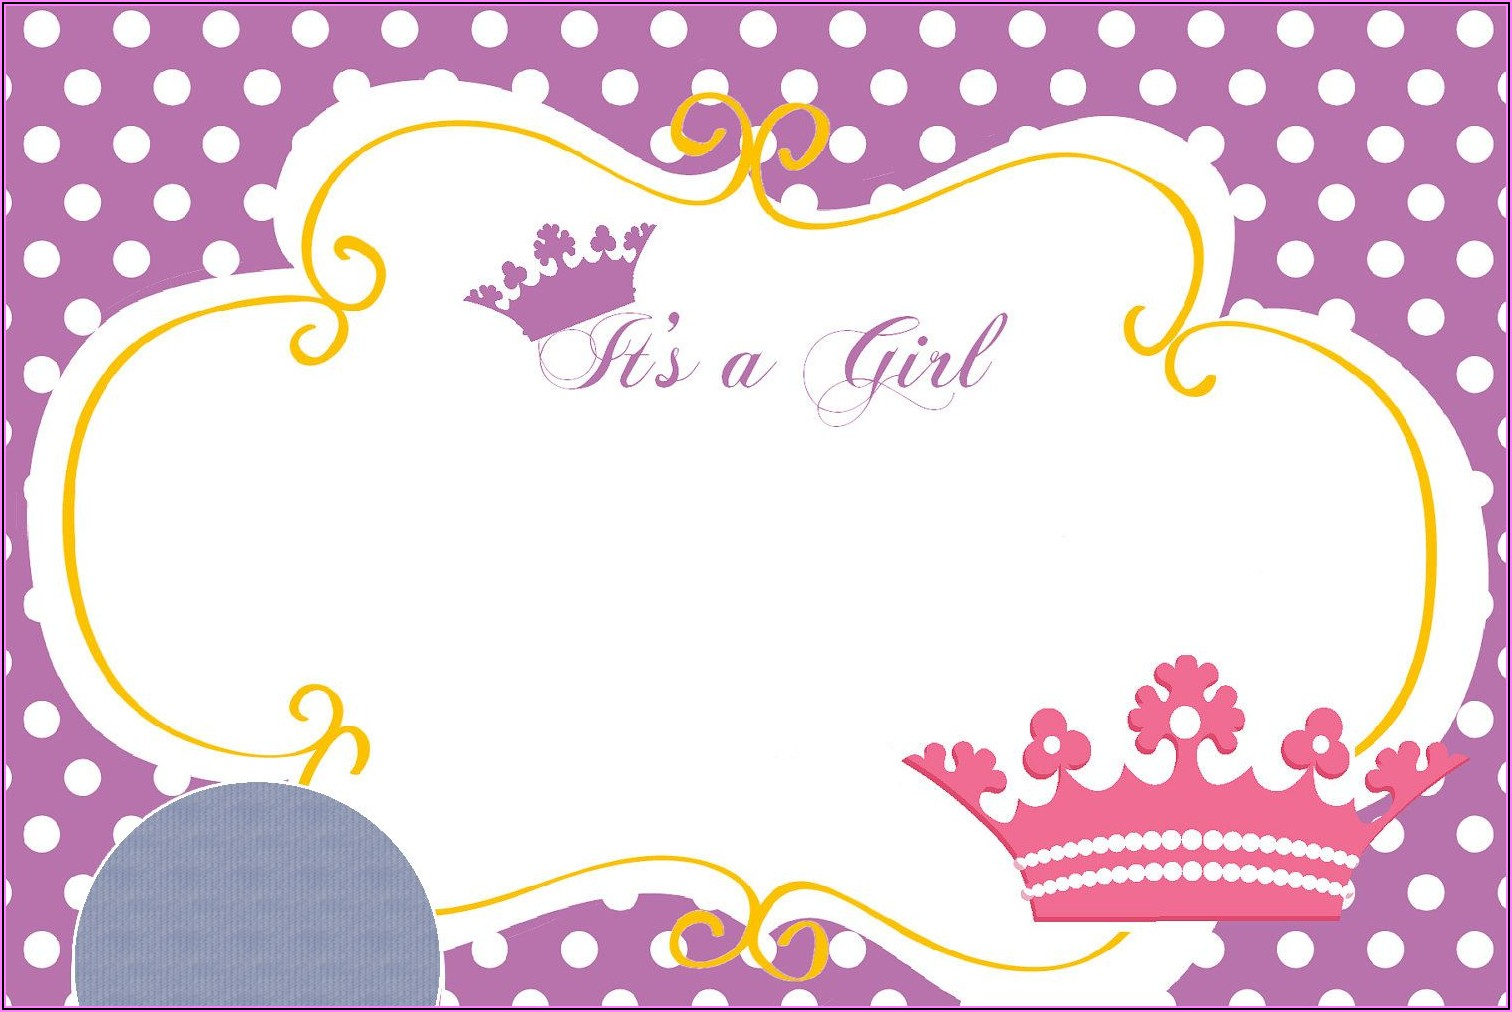 Disney Princess Invitations Free Download